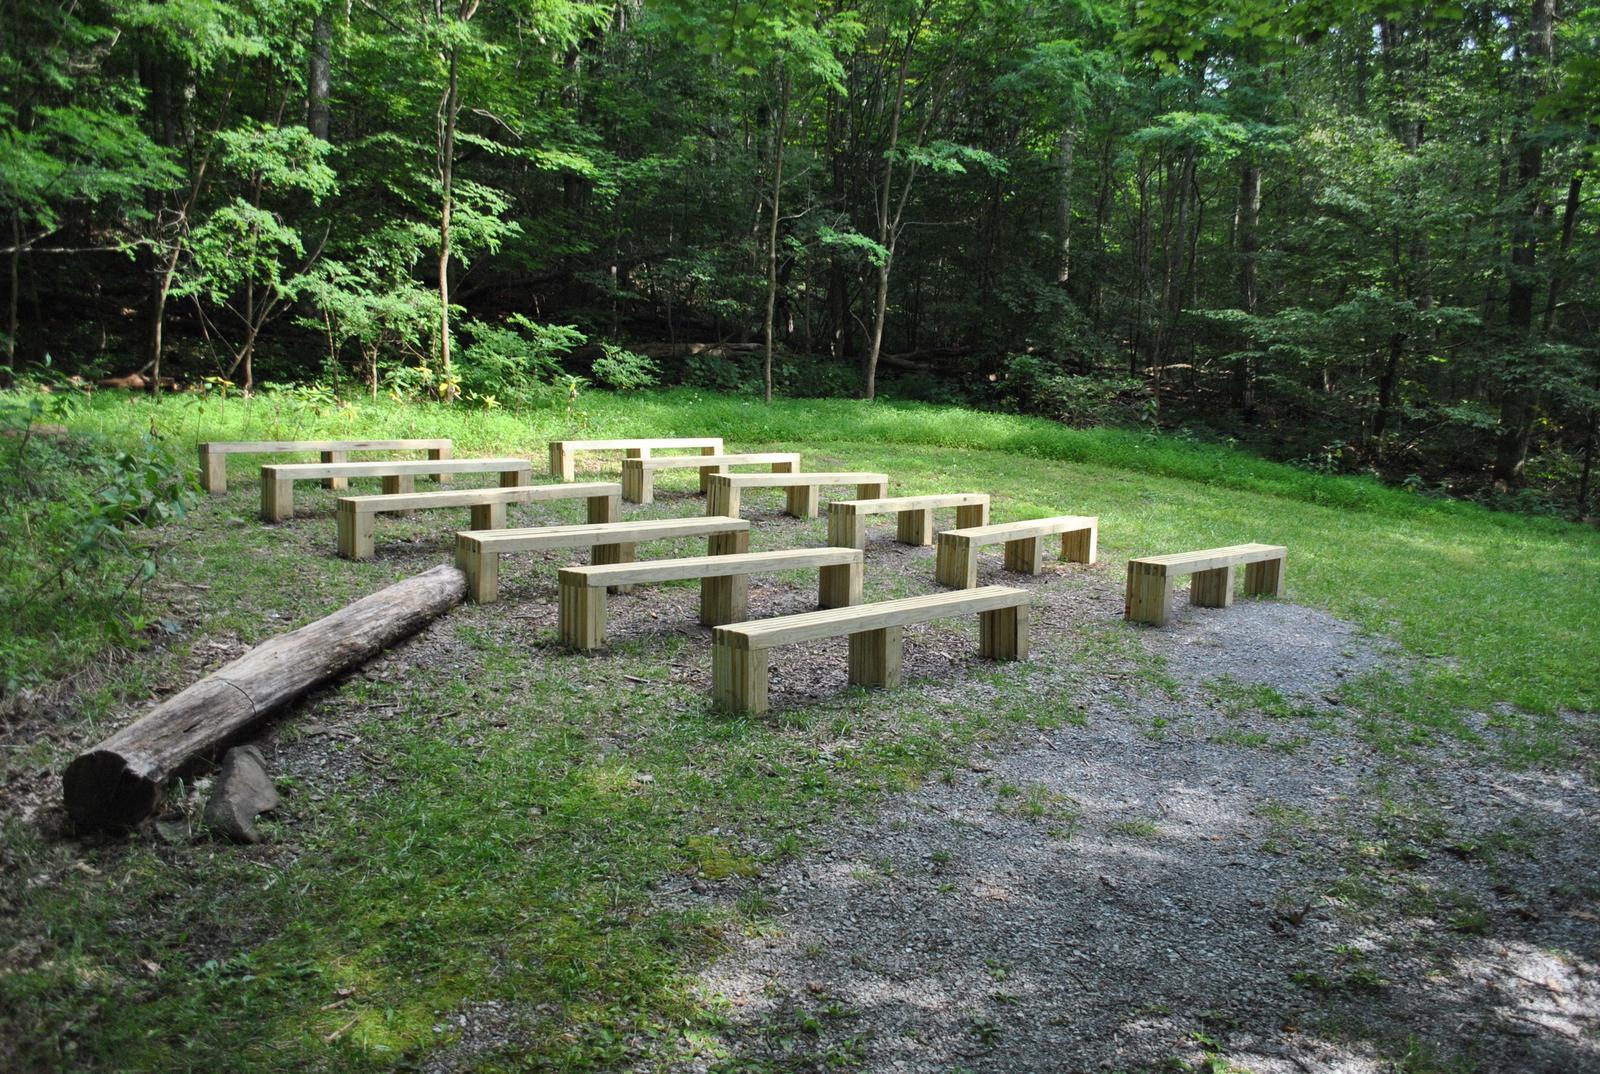 Mathews Arm Campground Amphitheater